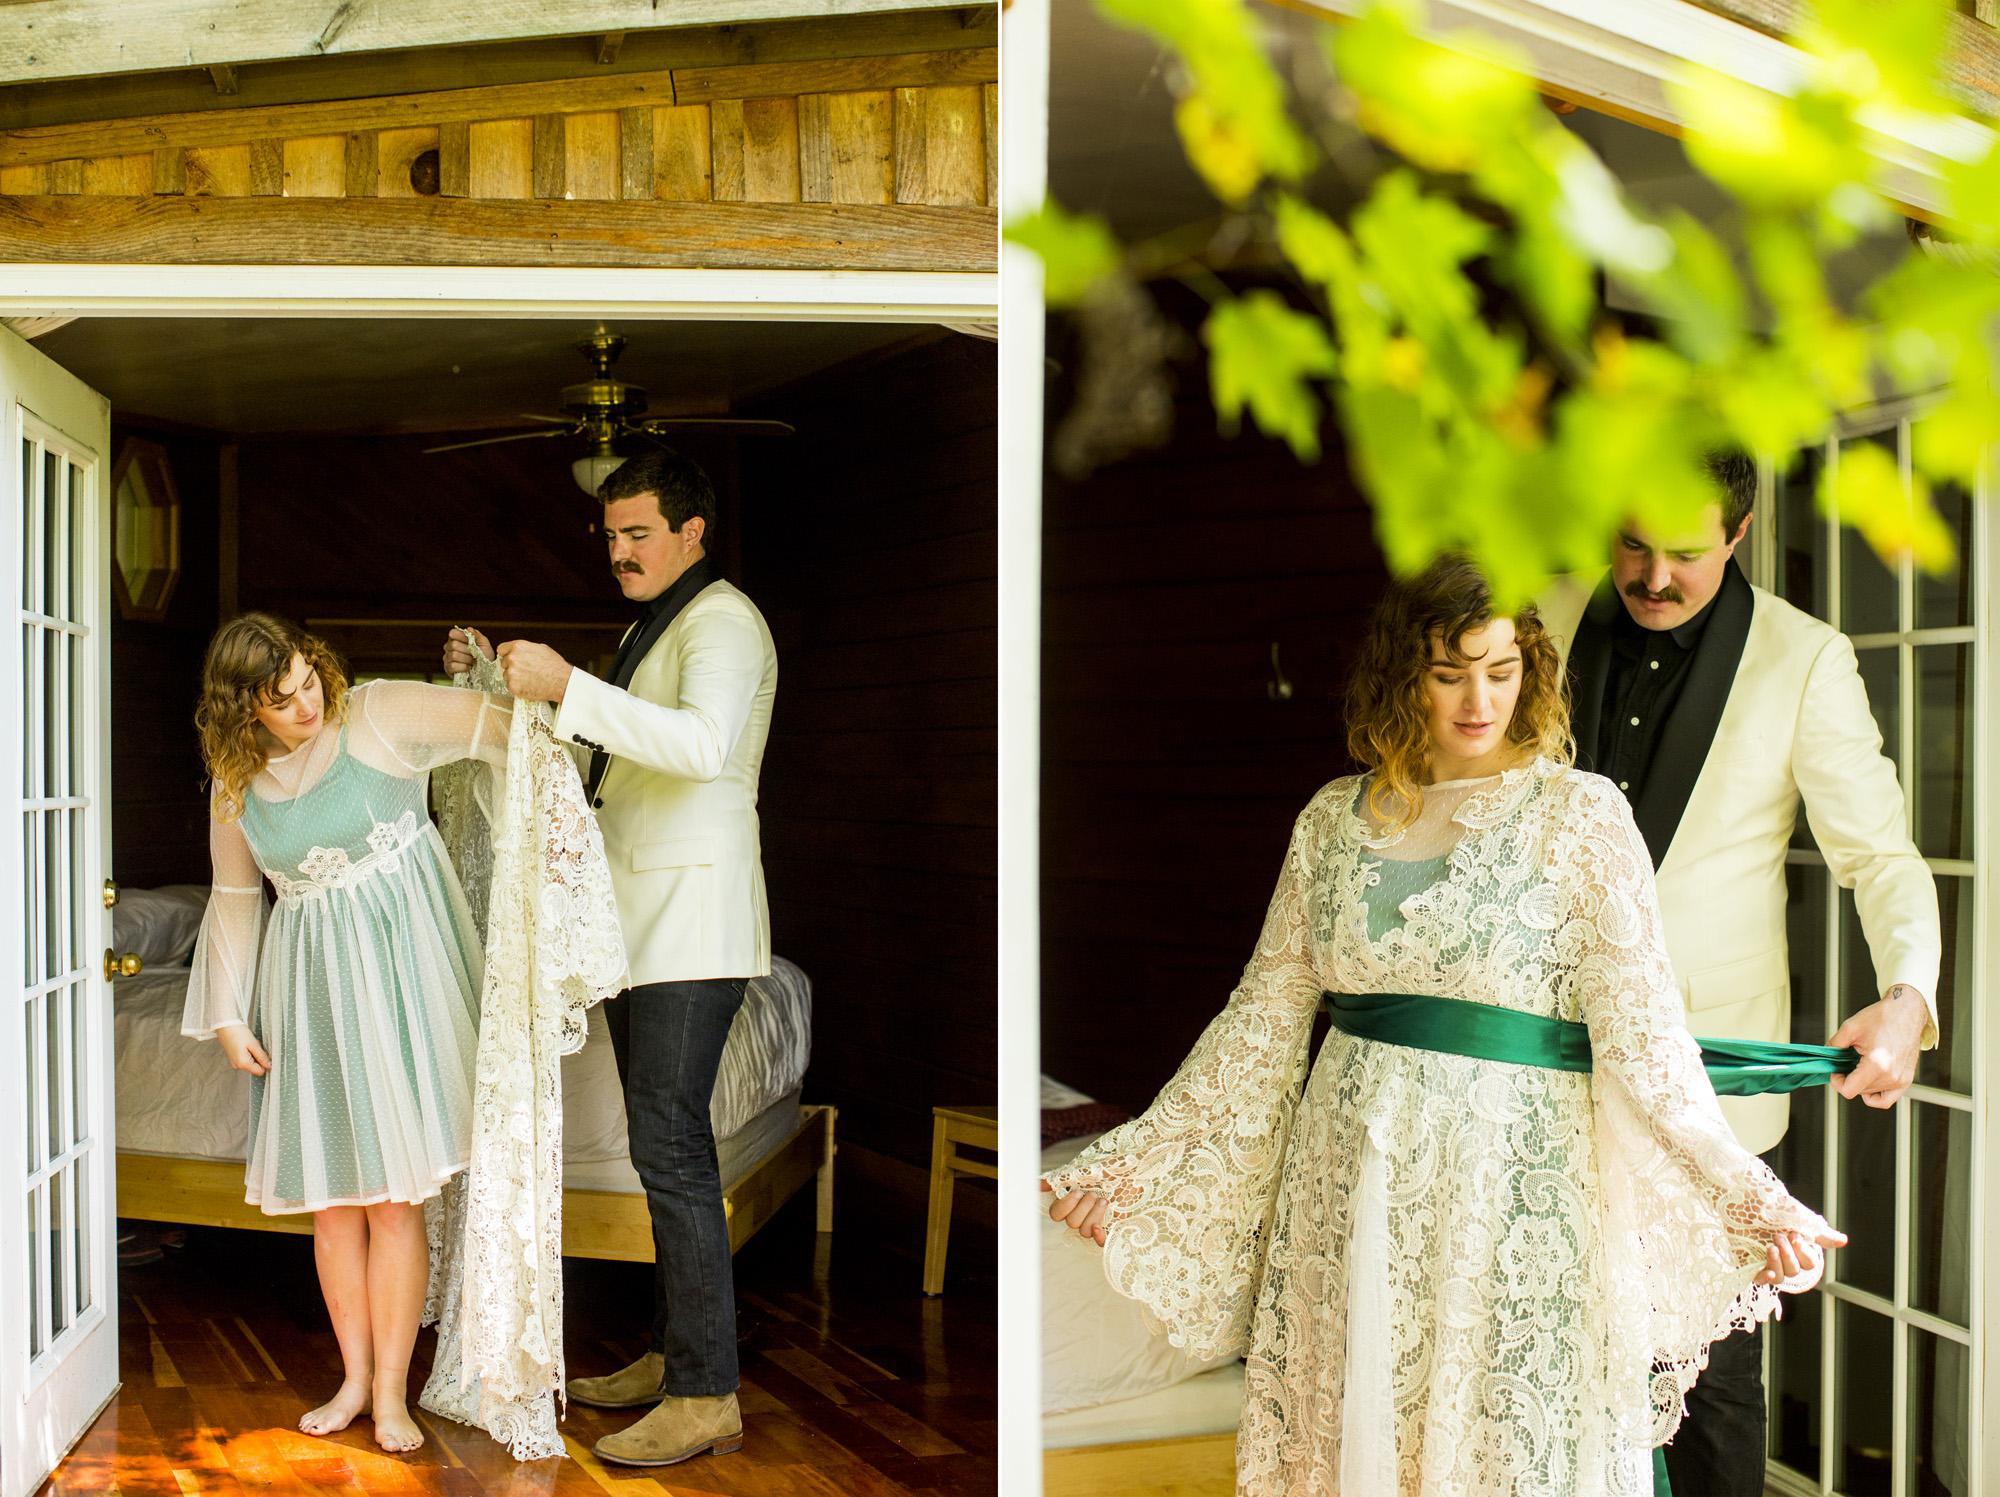 Seriously_Sabrina_Photography_Red_River_Gorge_Kentucky_Wedding_ShawnDana46.jpg